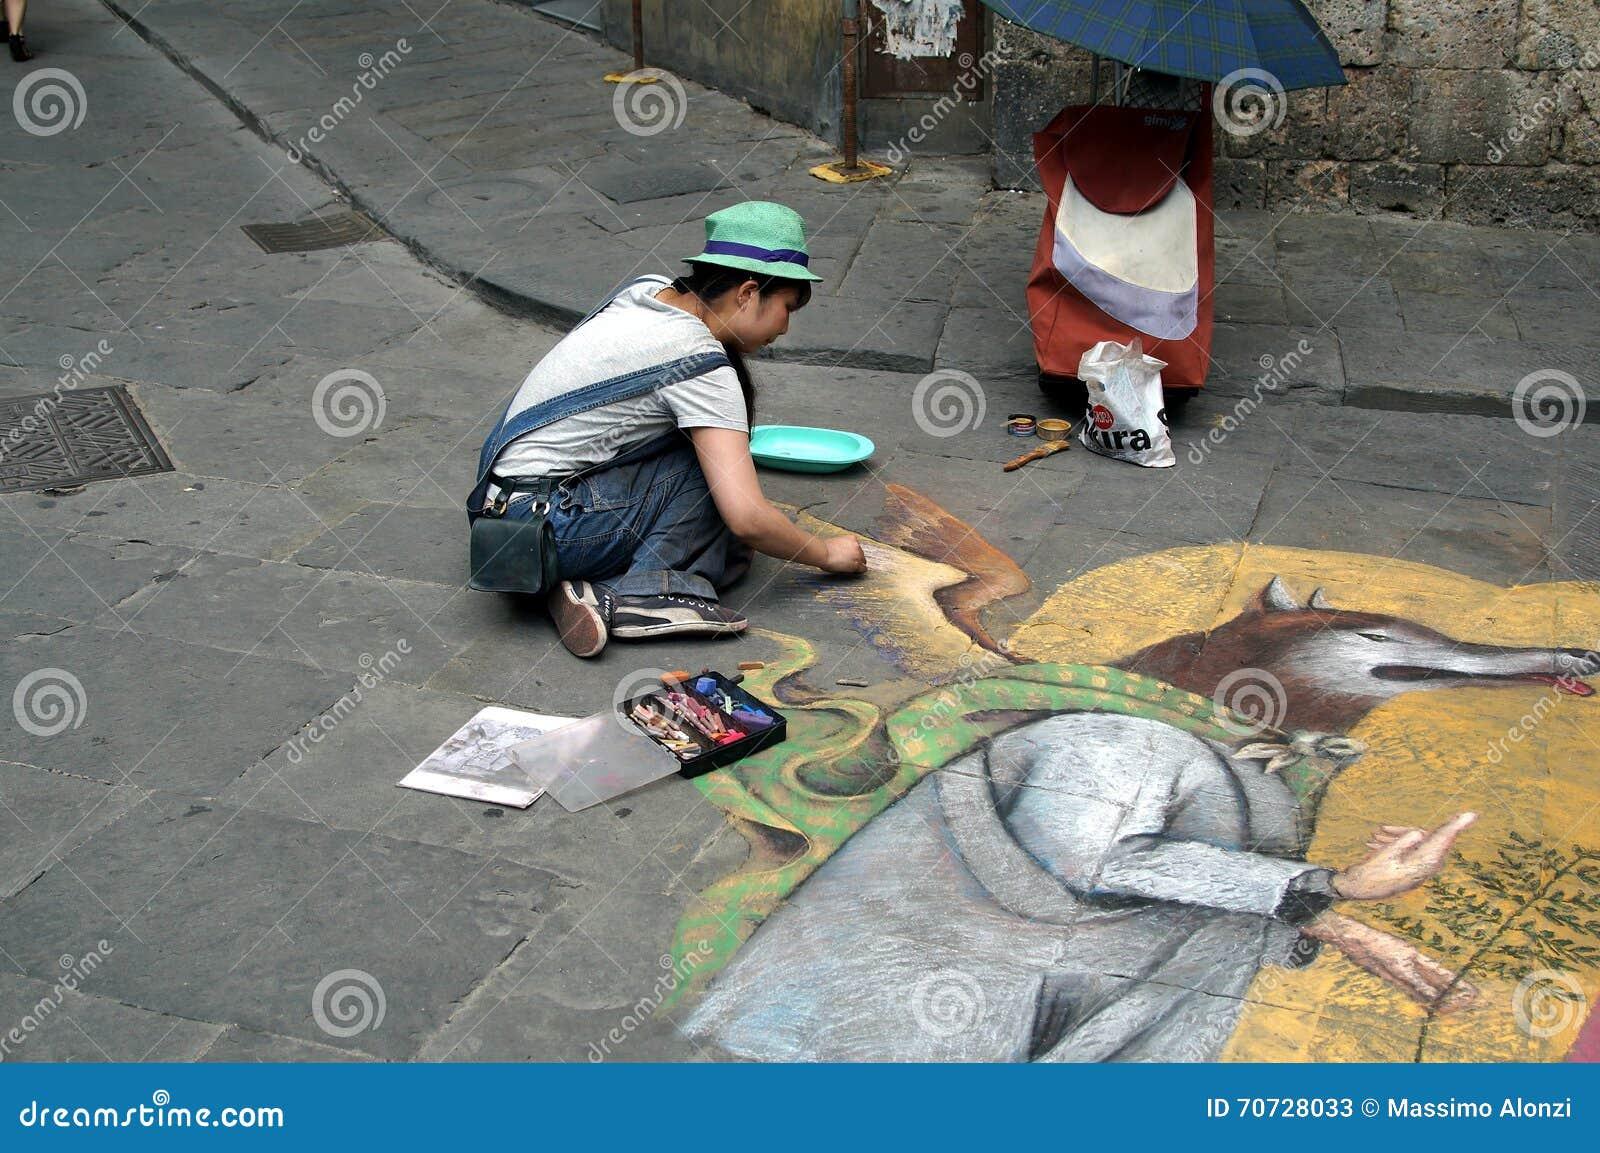 Street artist in Siena